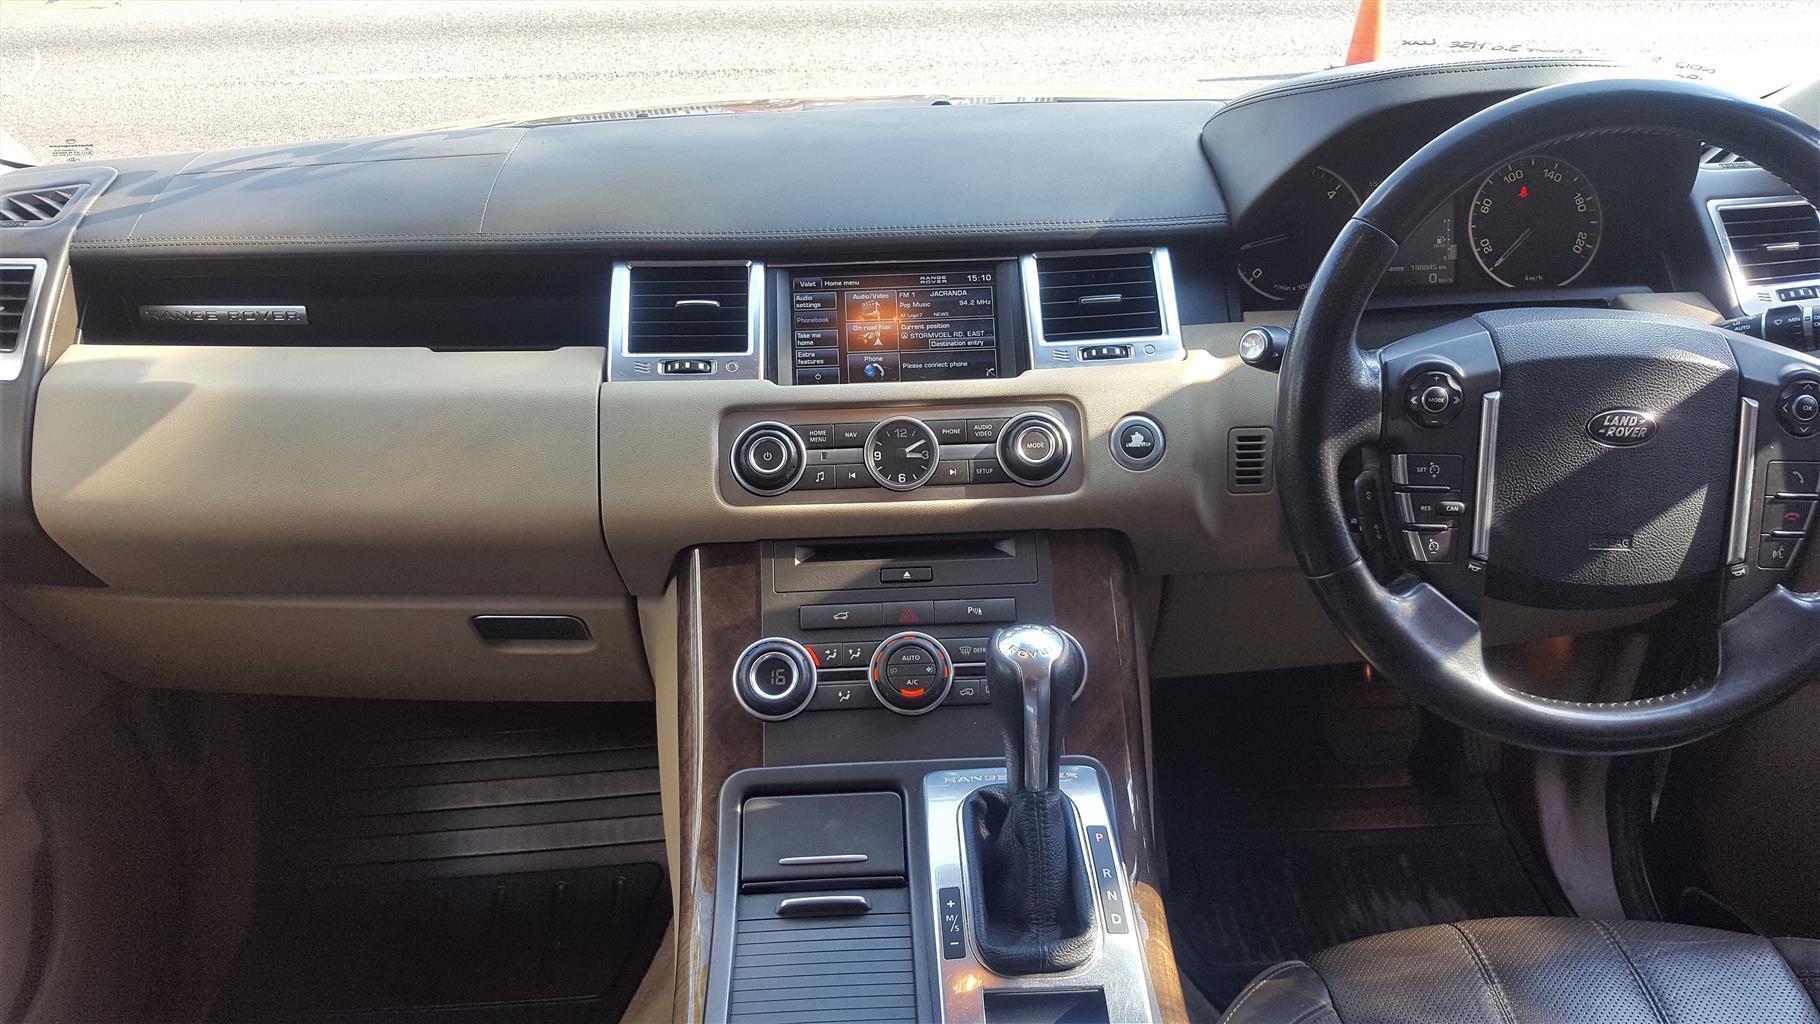 2012 Land Rover Range Rover Sport SDV6 HSE Luxury